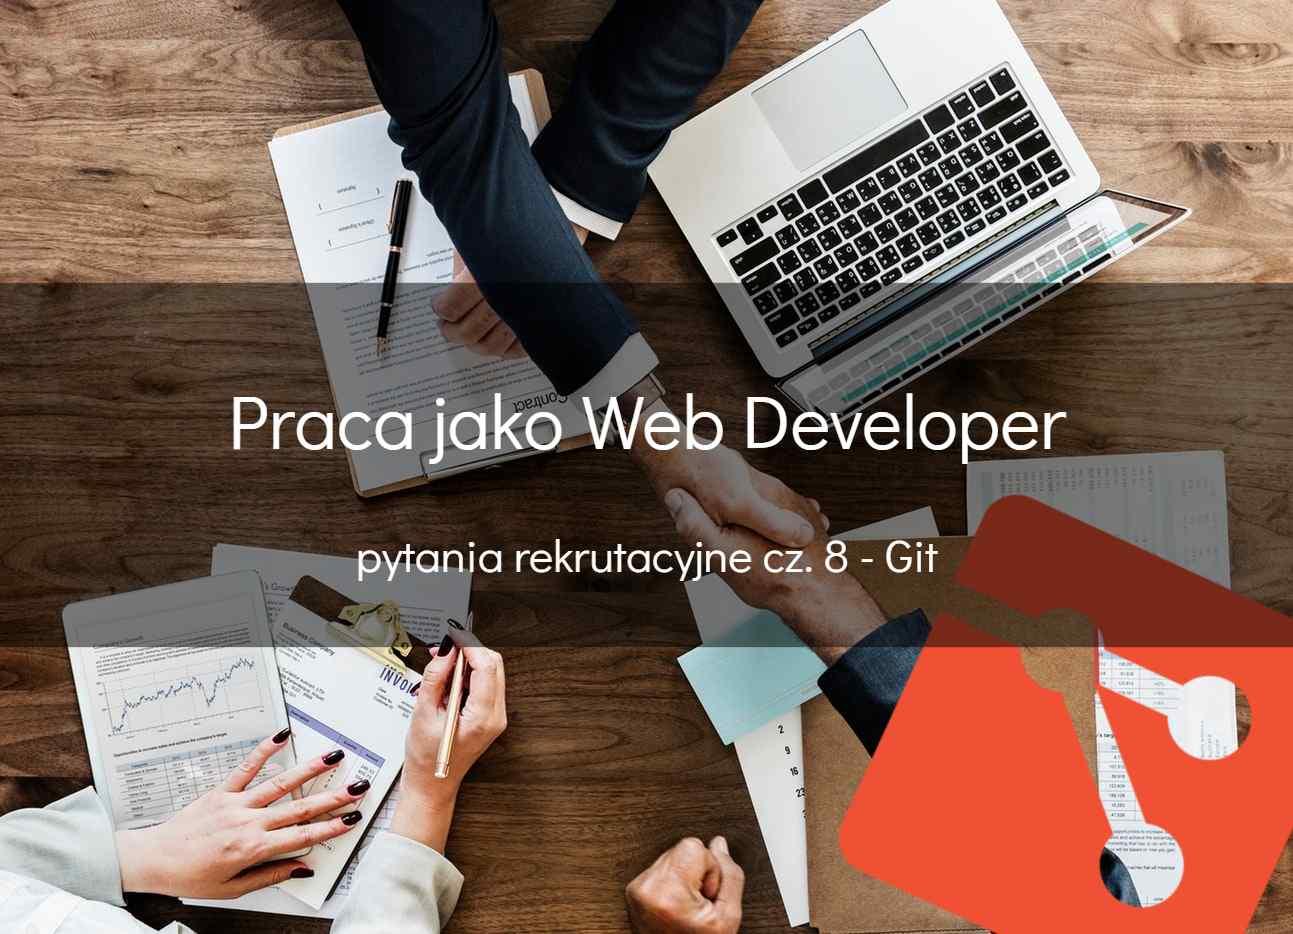 Web developer – pytania rekrutacyjne cz.8 – Git